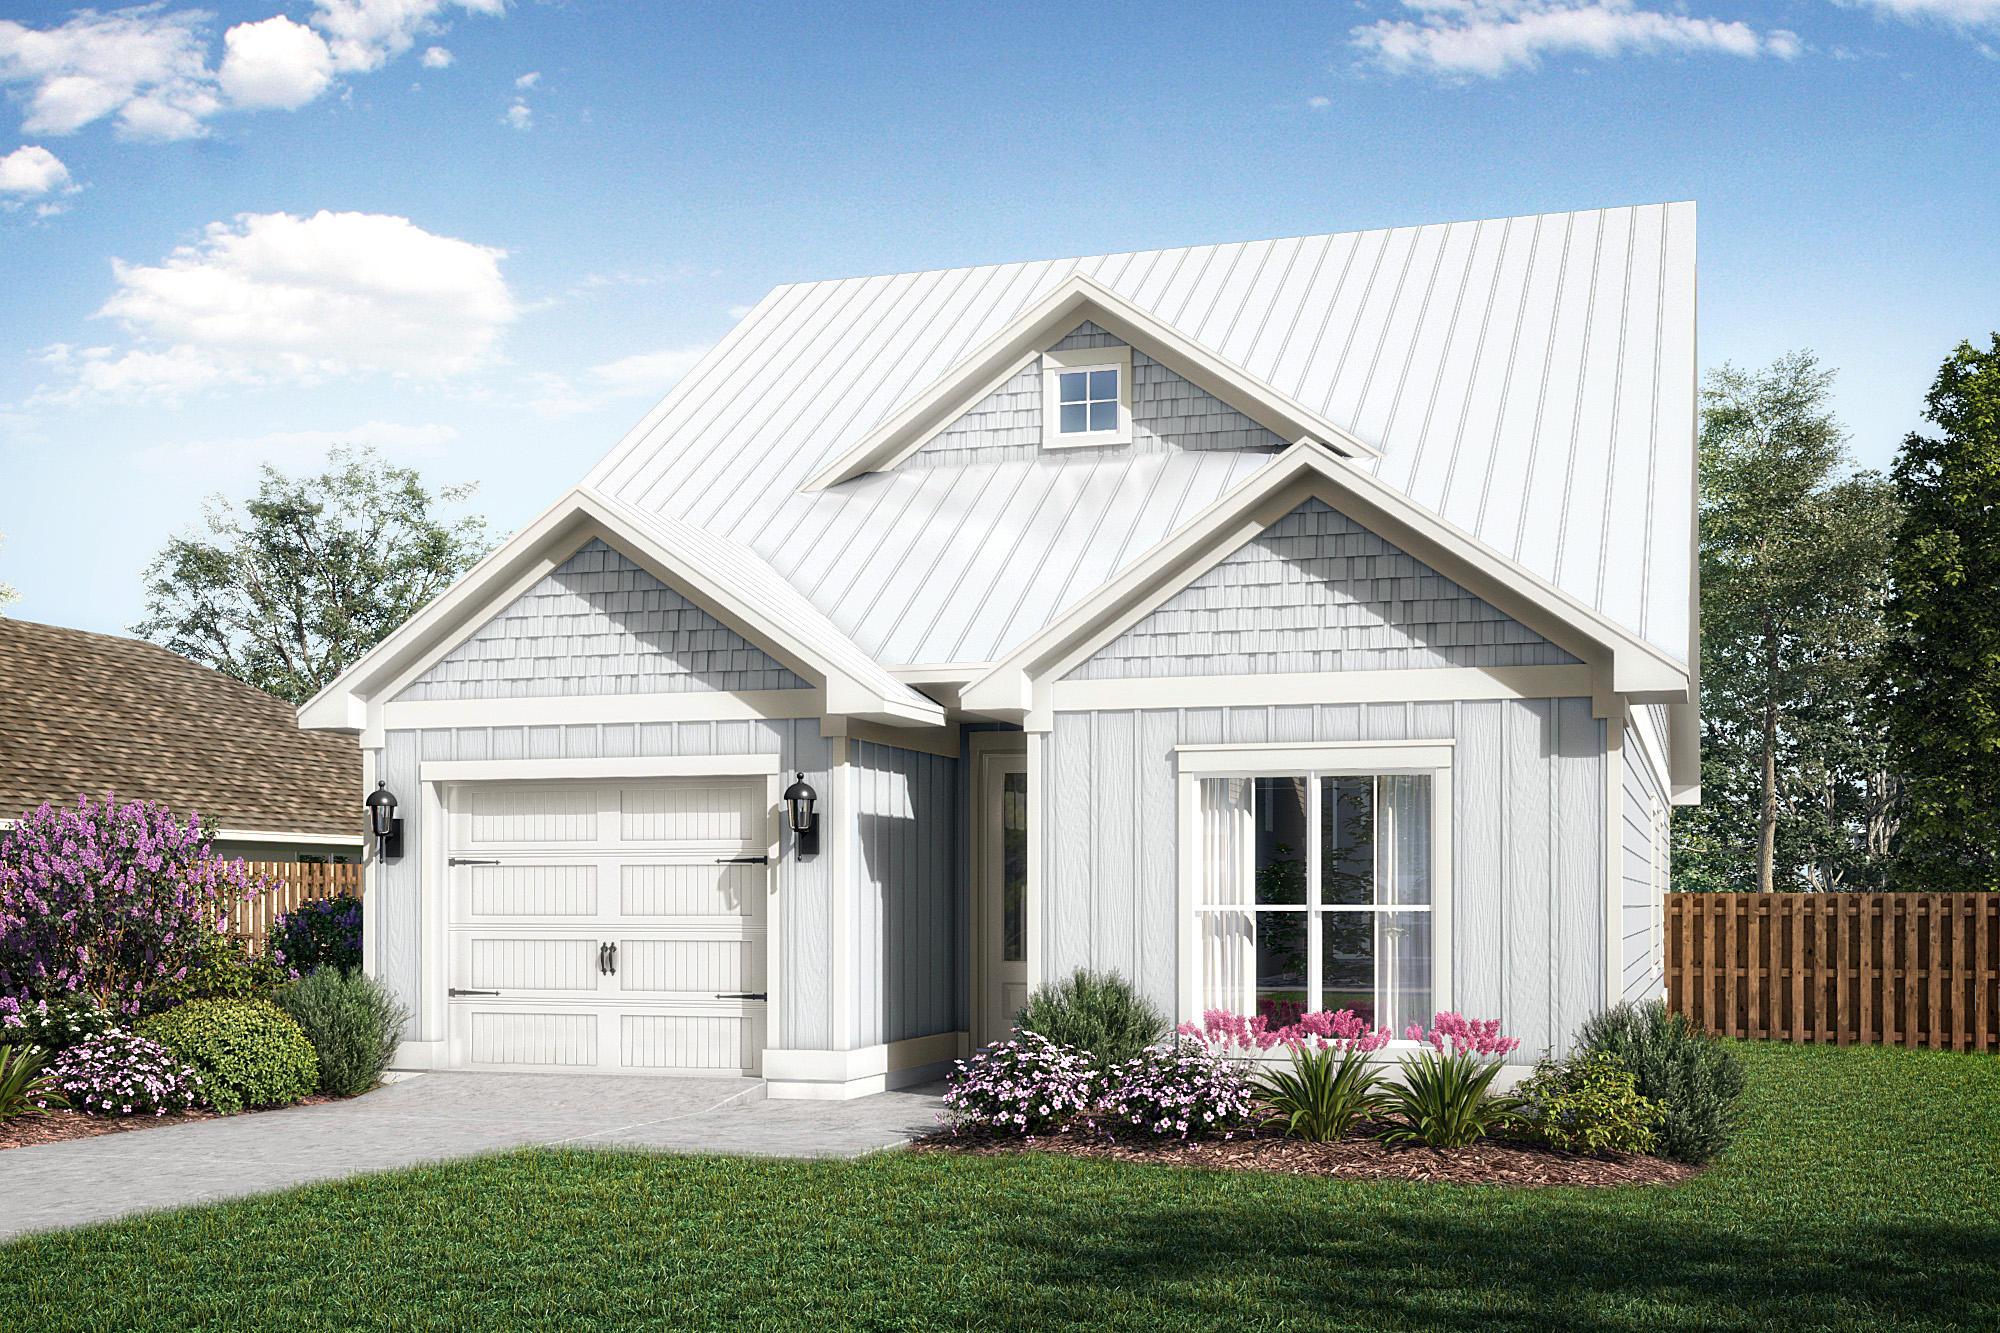 Photo of home for sale at 306 Rachel, Santa Rosa Beach FL